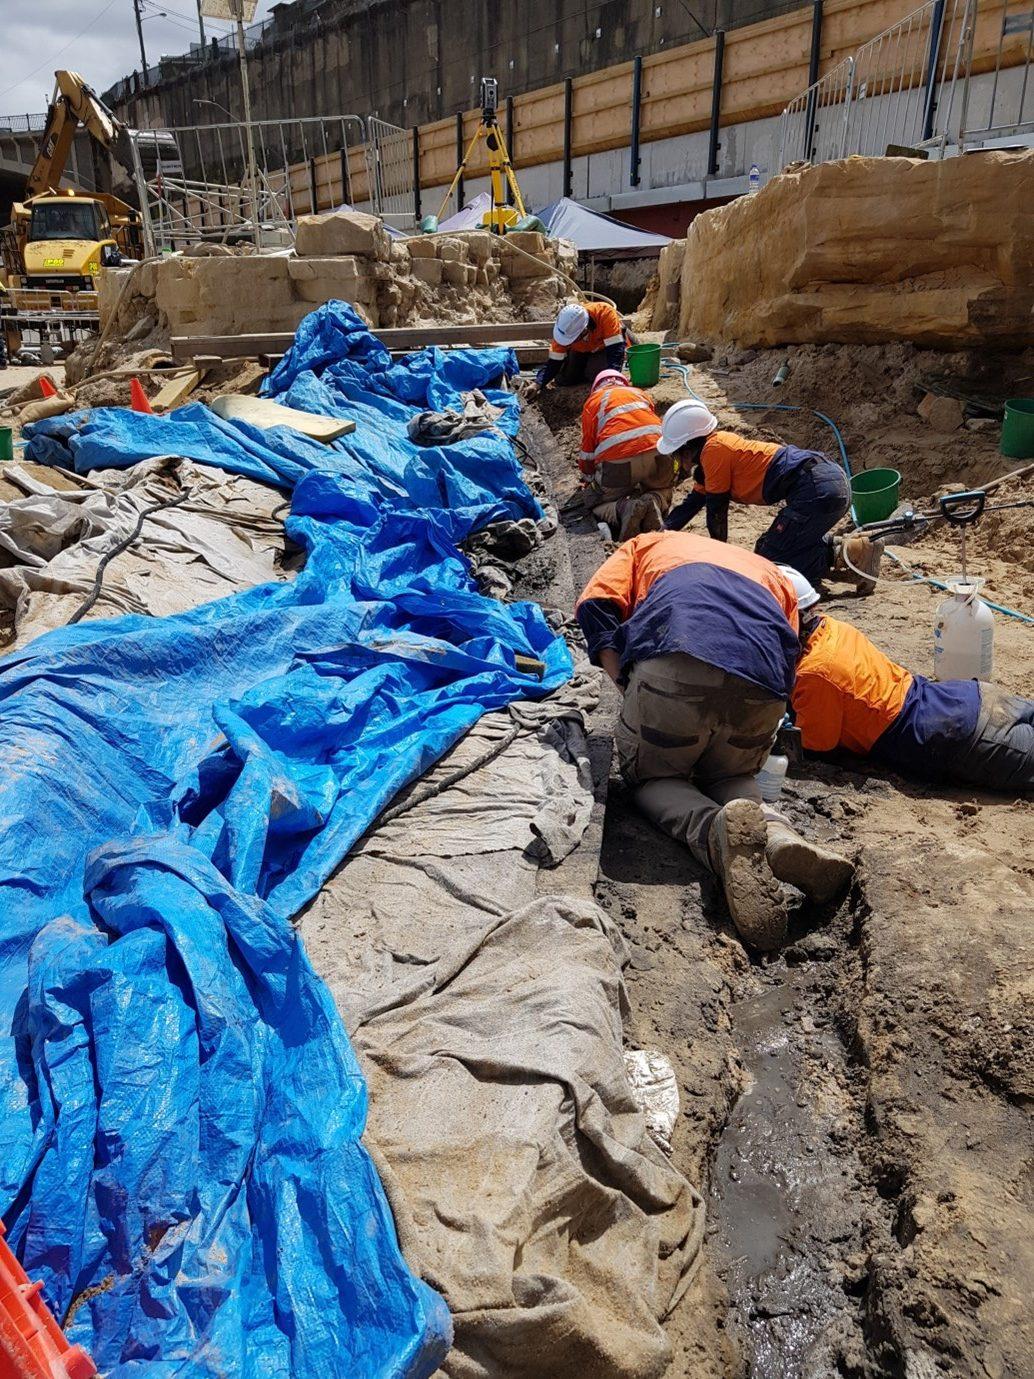 Barangaroo Boat excavation. Image: Renee Malliaros/Silentworld Foundation for Sydney Metro, 2018.